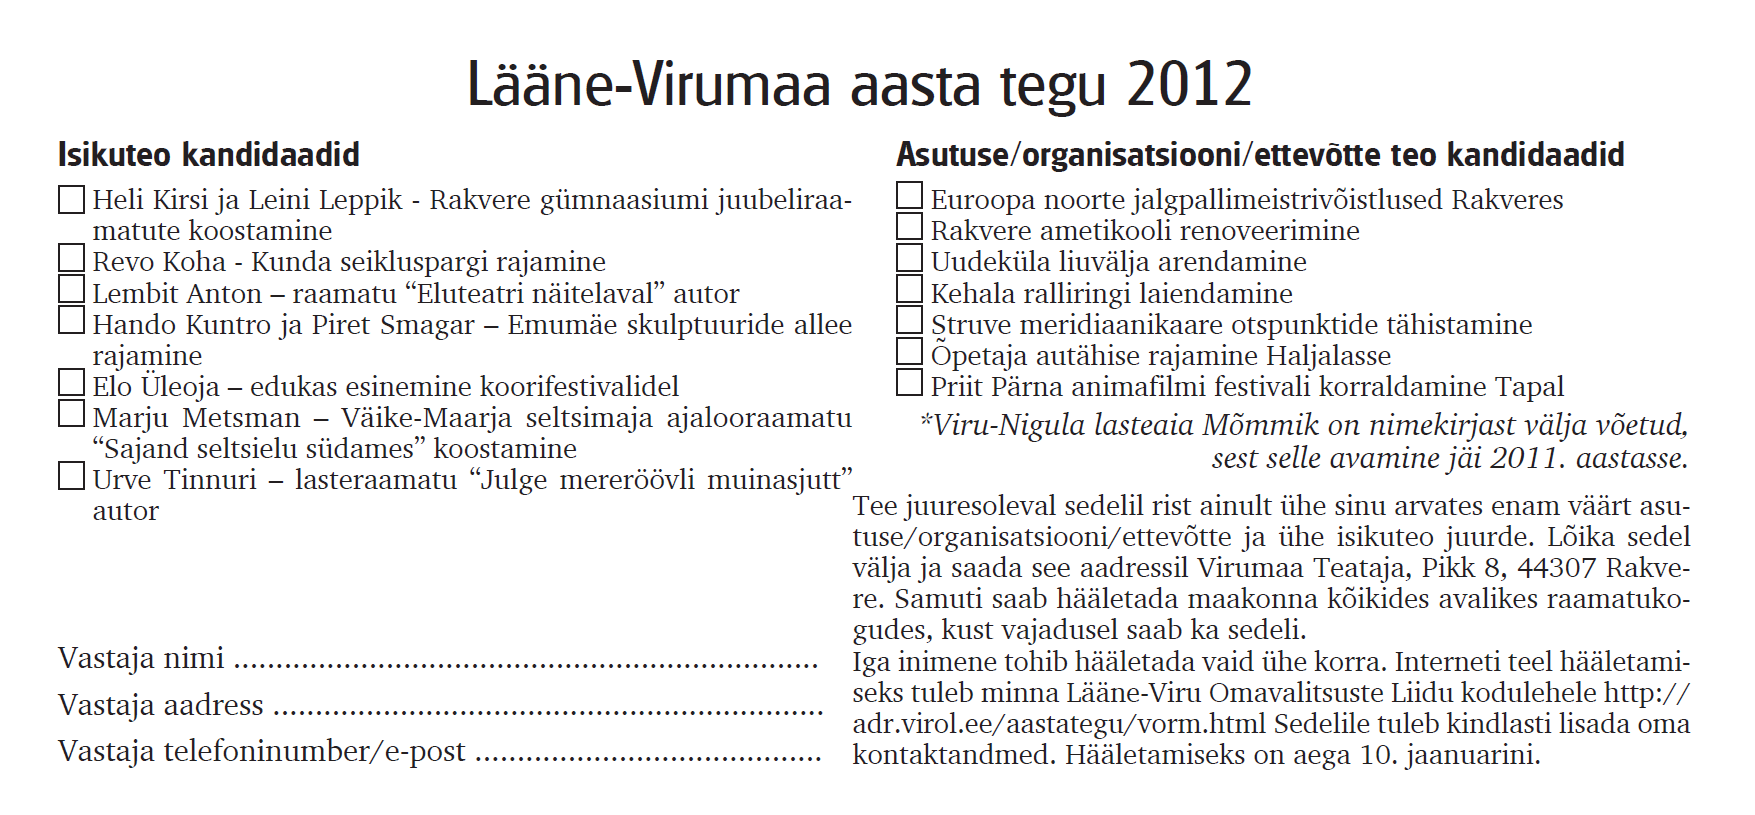 Lääne-Virumaa aasta tegu 2012